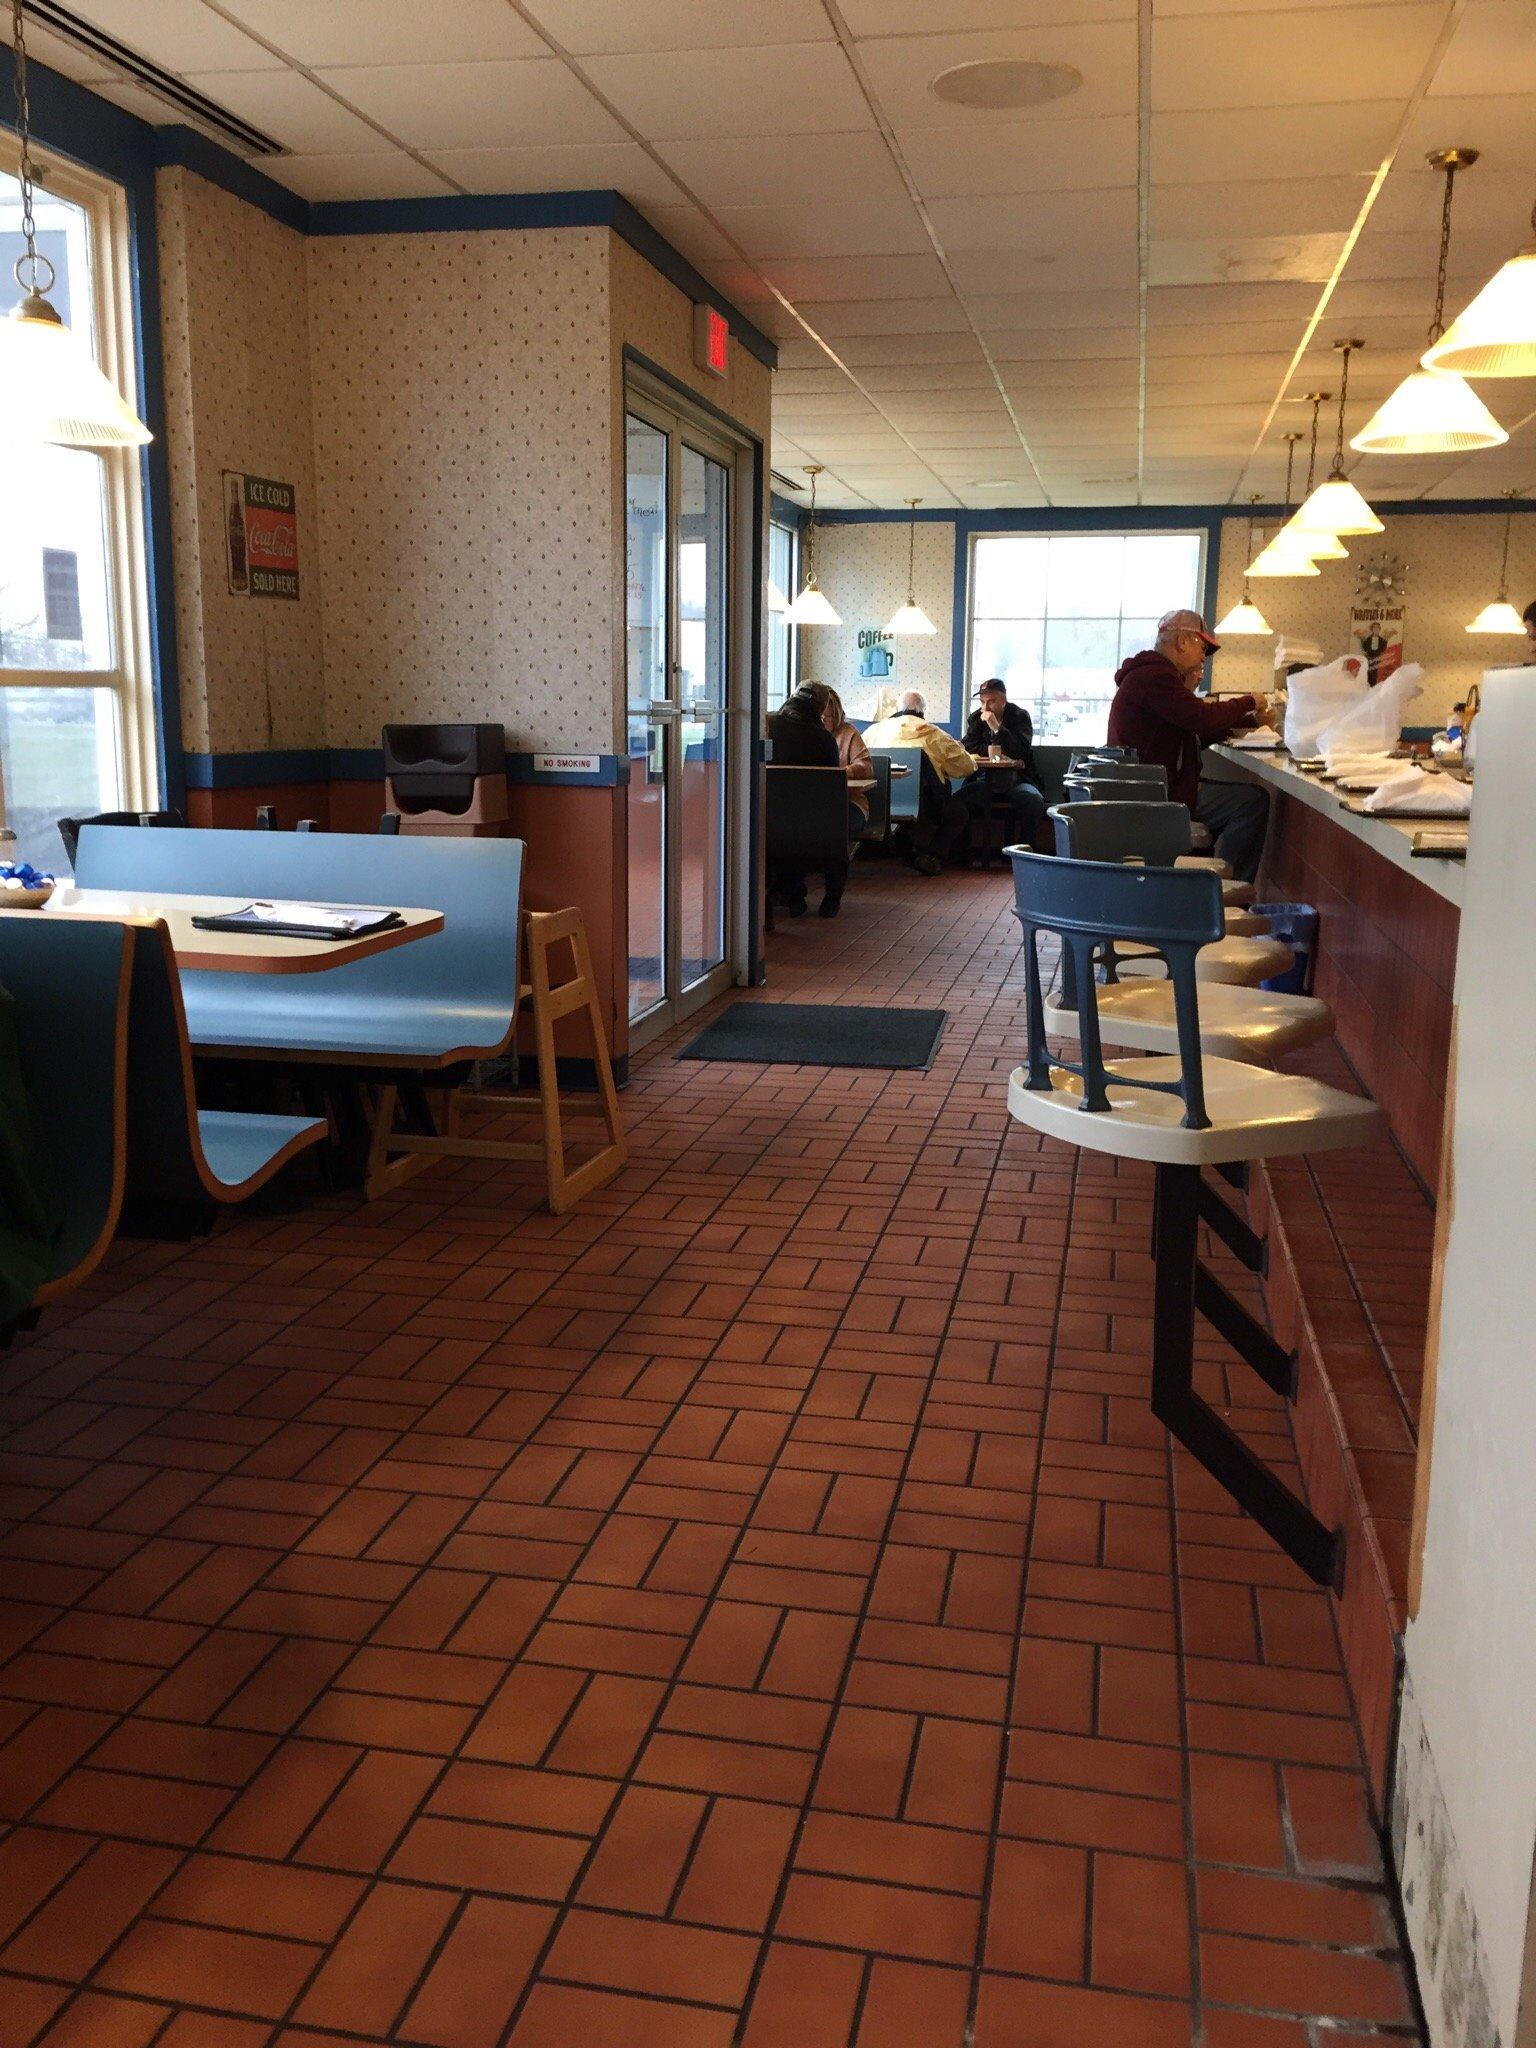 The Waffle Company